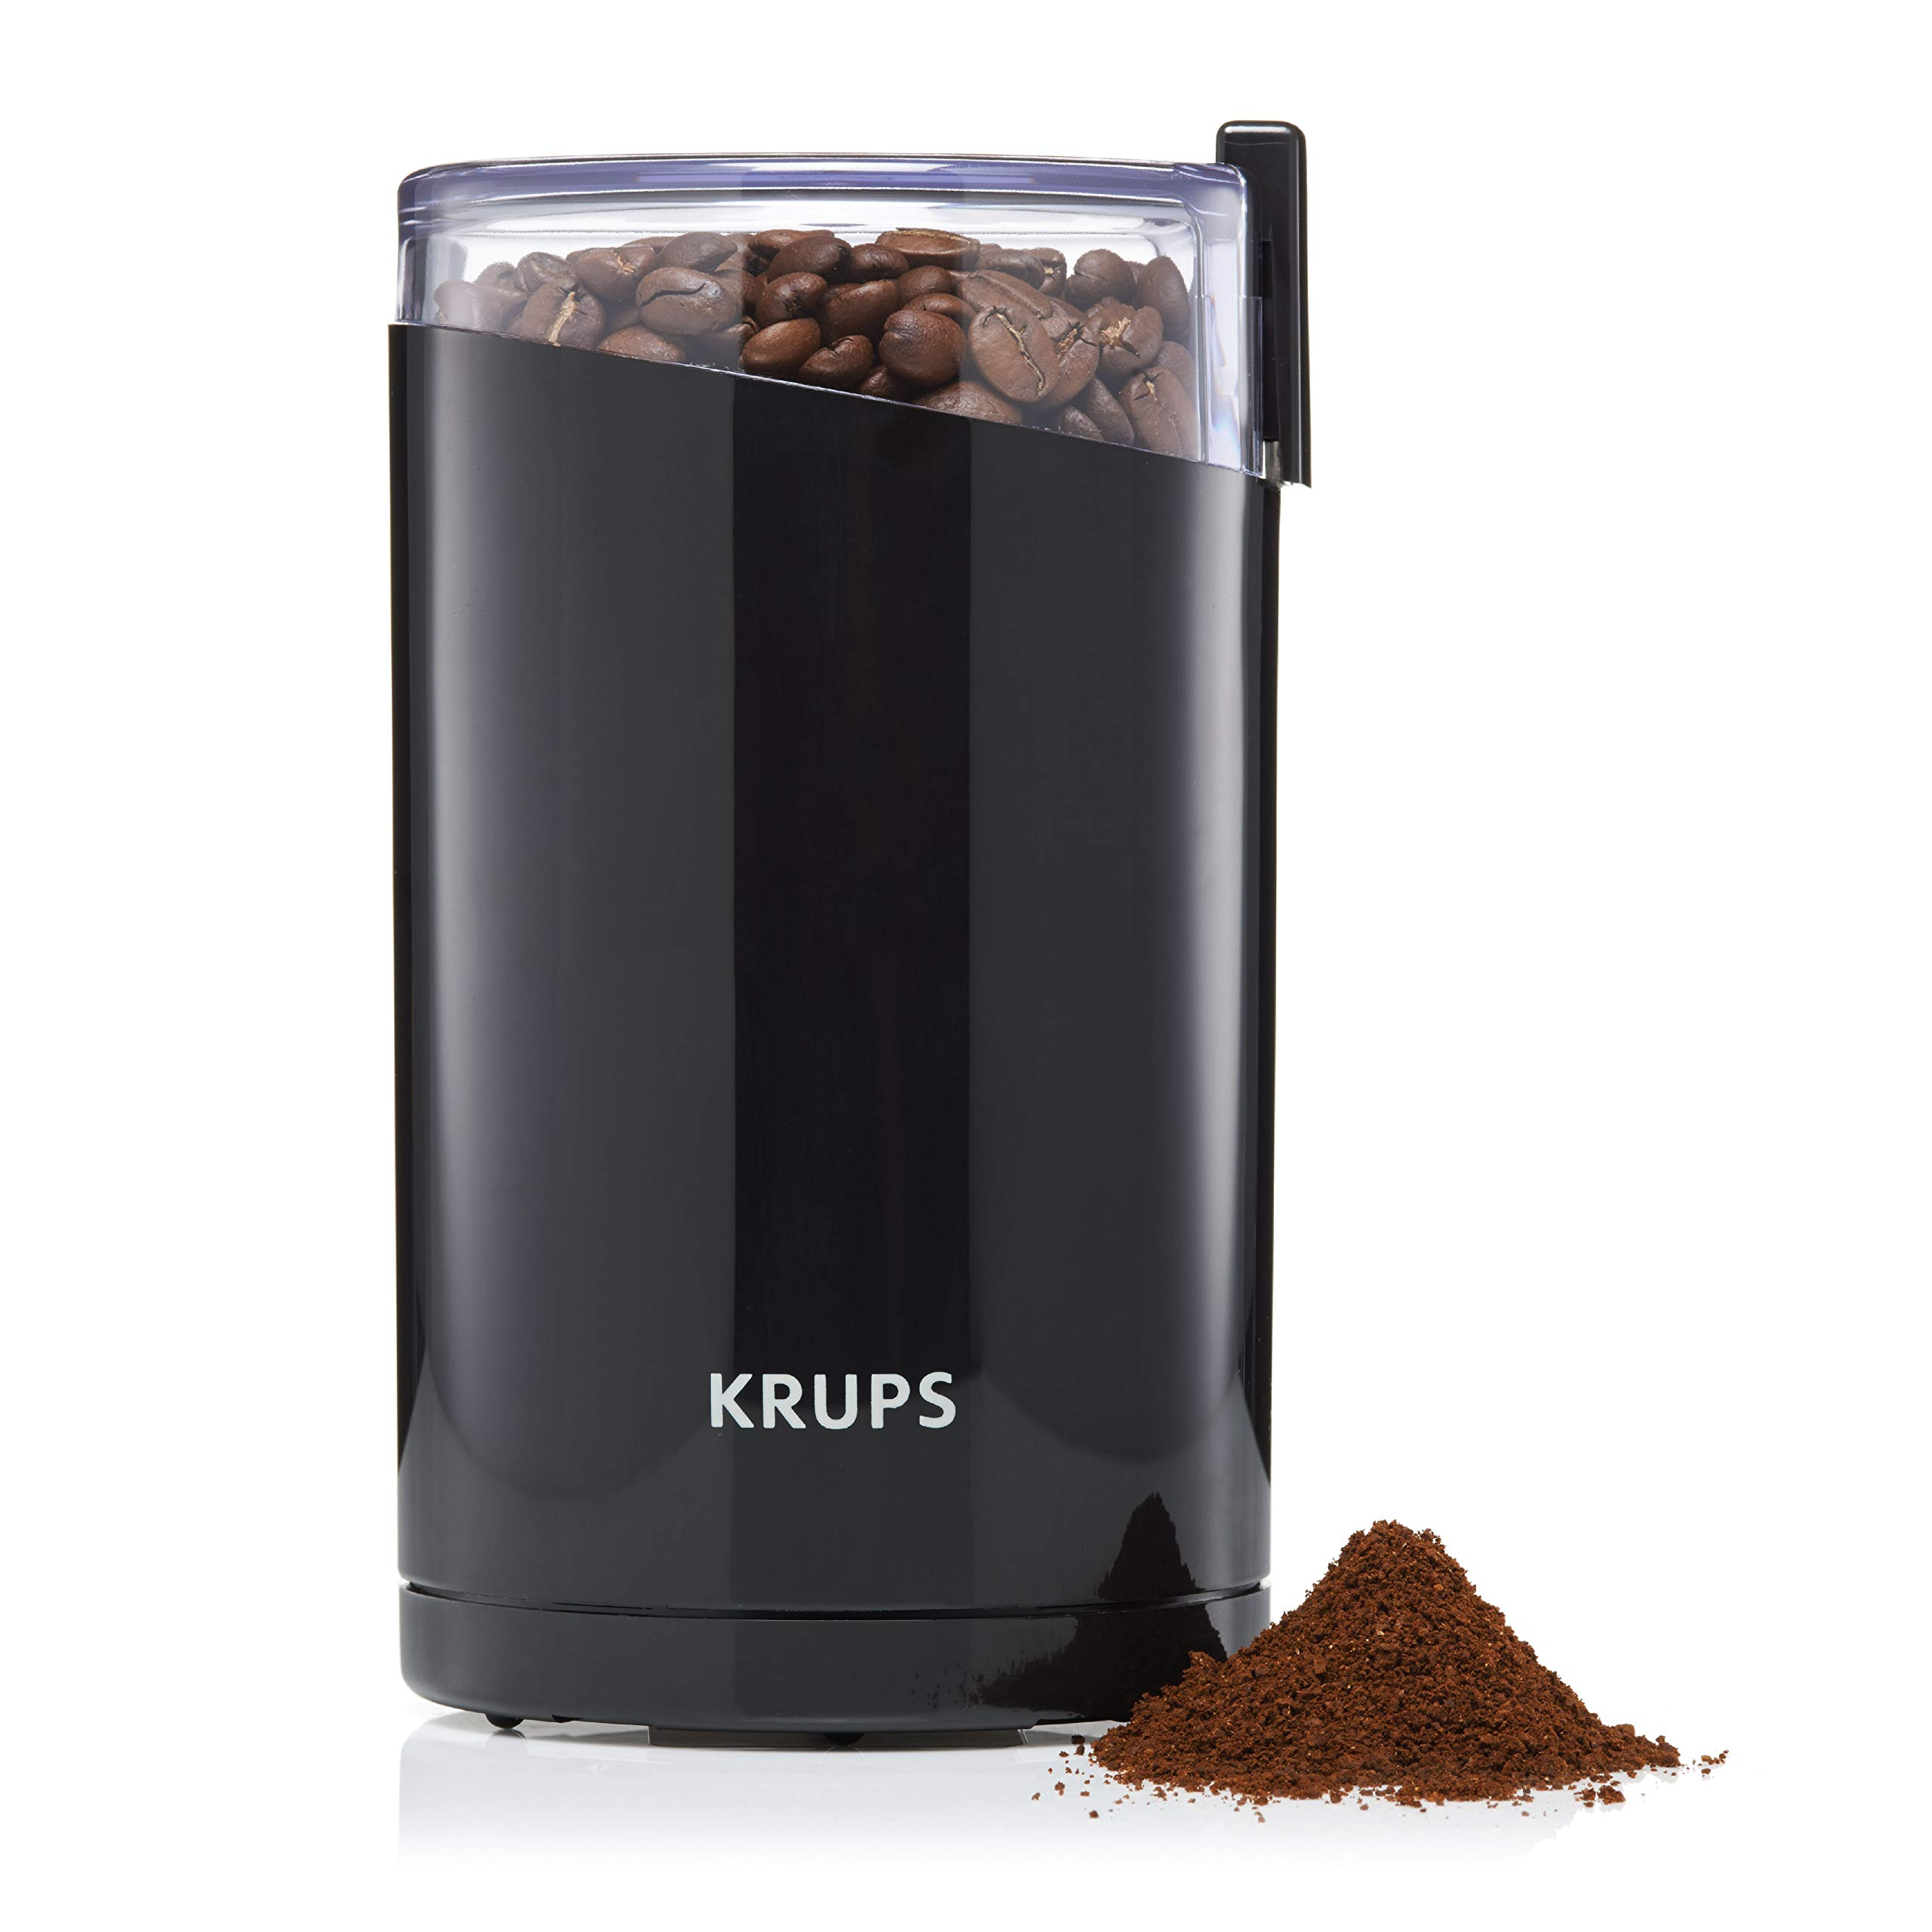 KRUPS F203 Pro Review